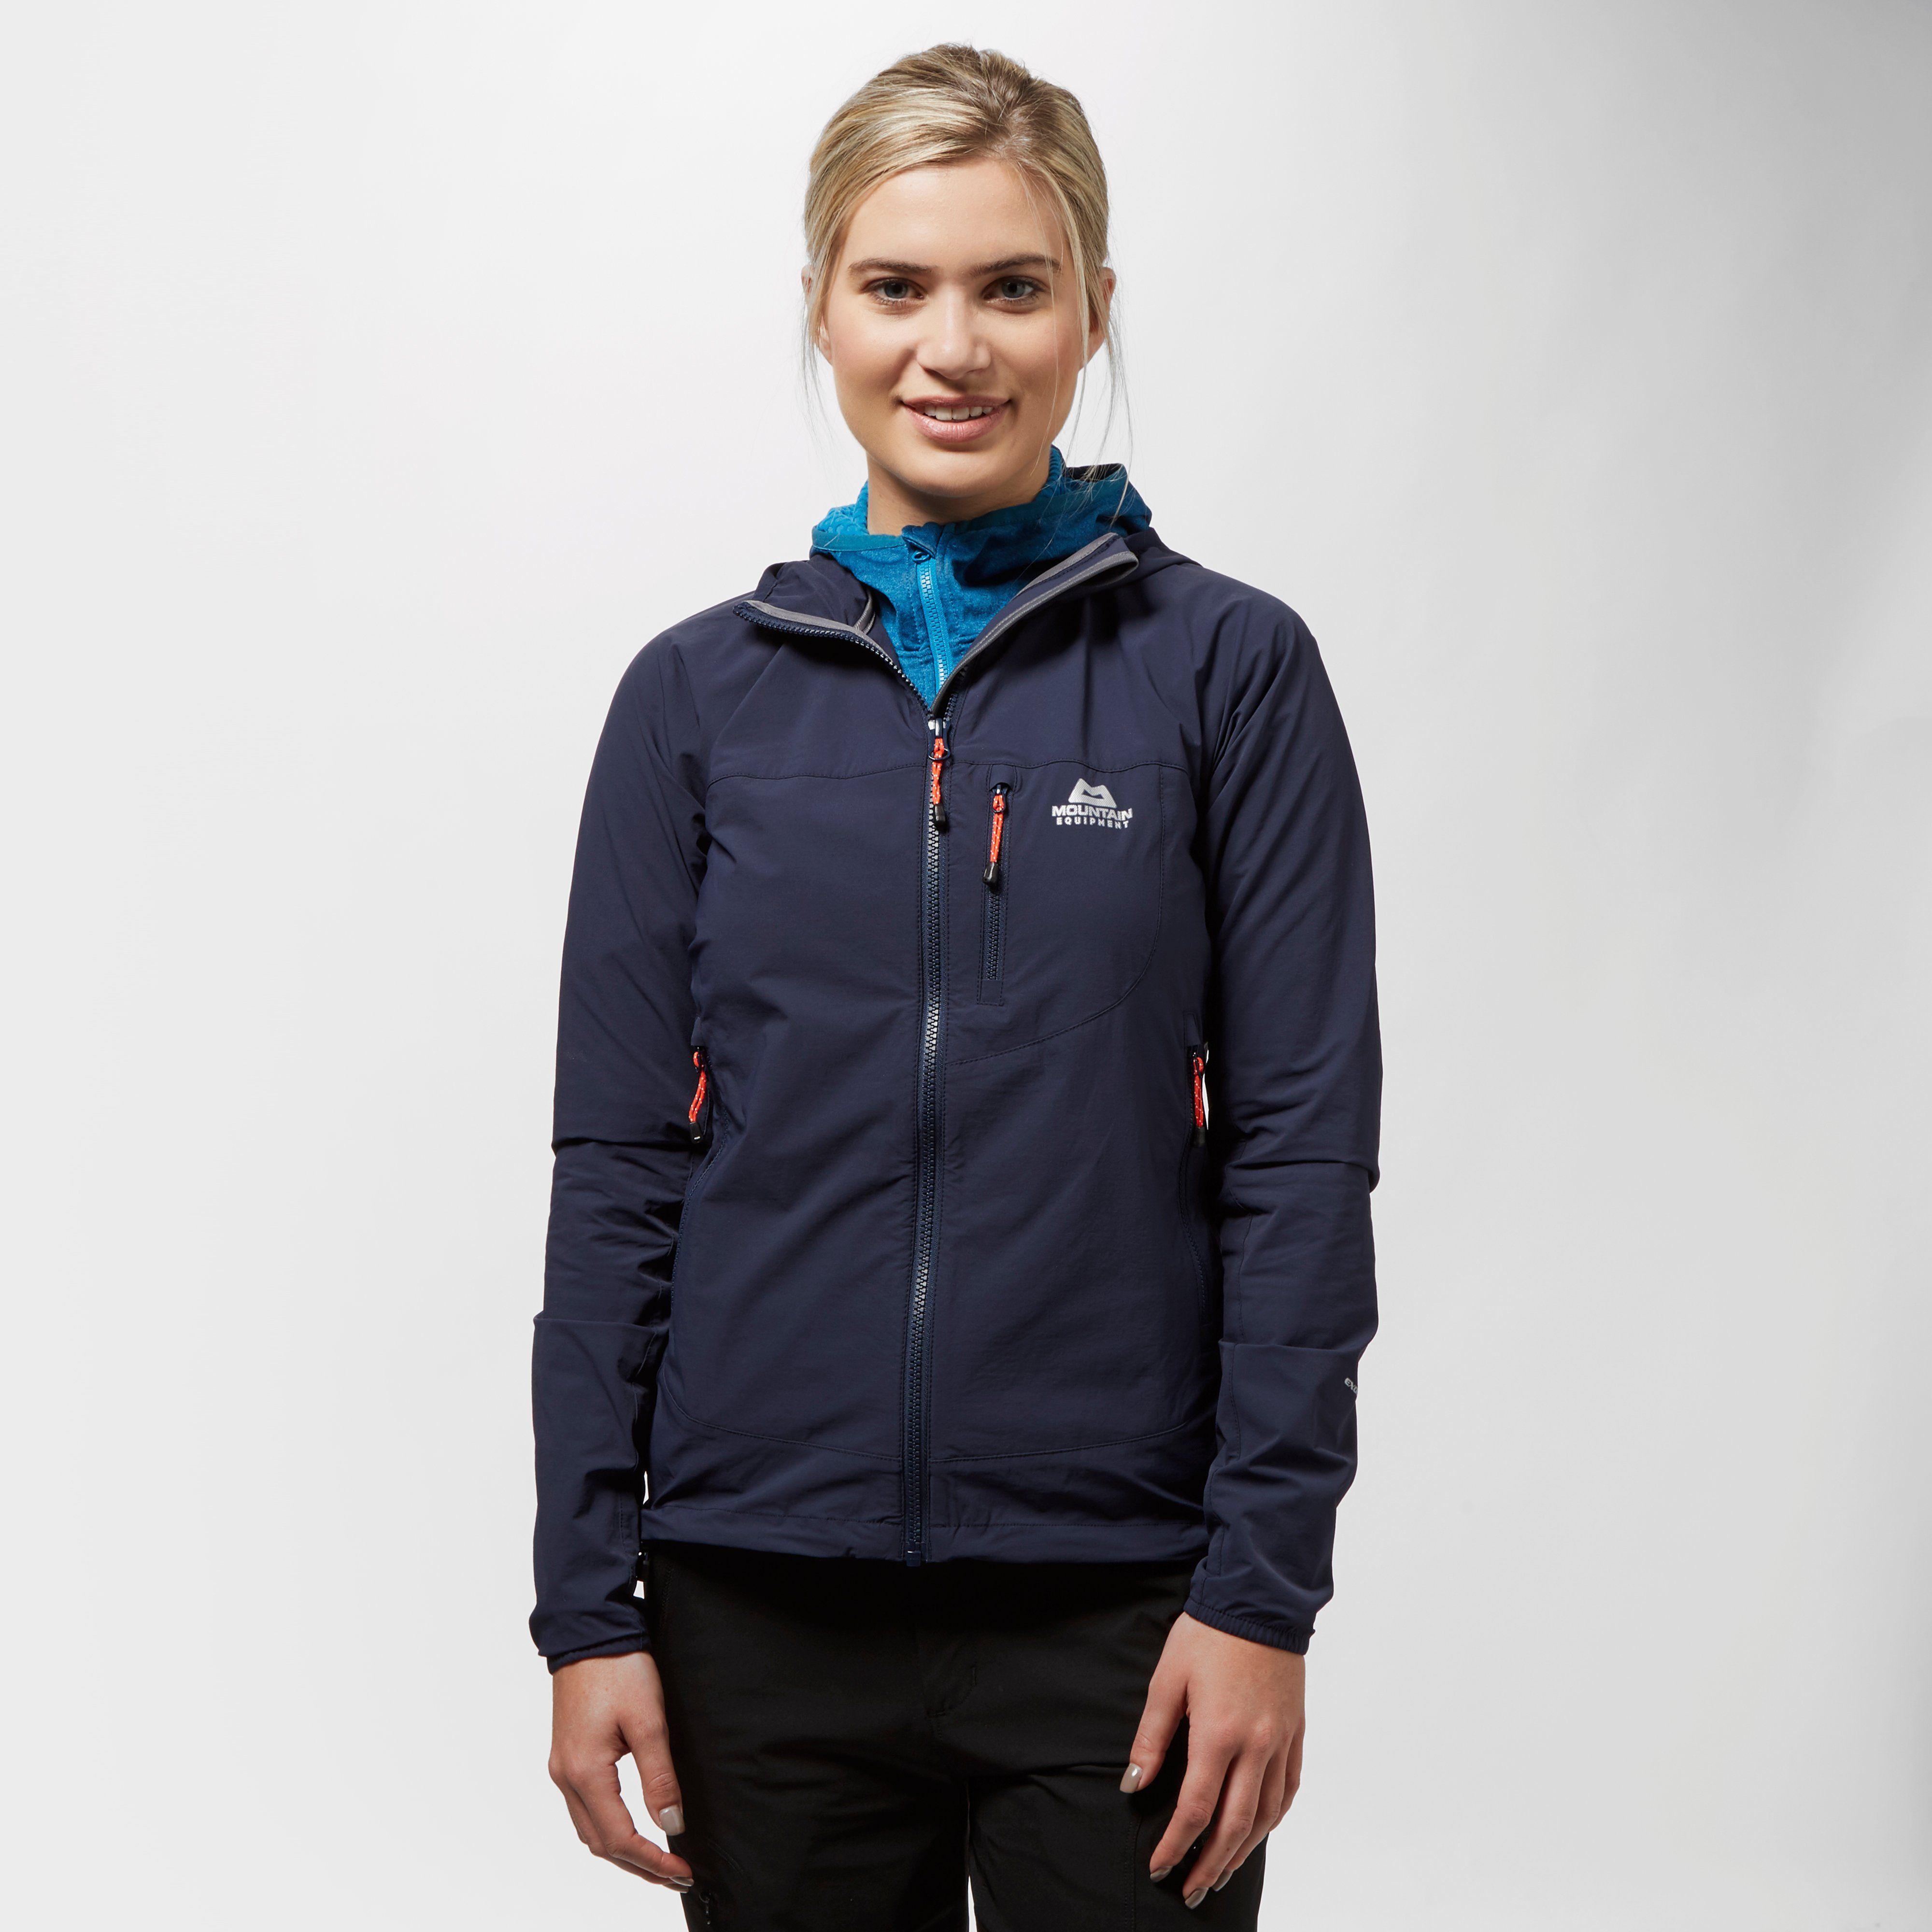 MOUNTAIN EQUIPMENT Women's Echo Hooded Jacket